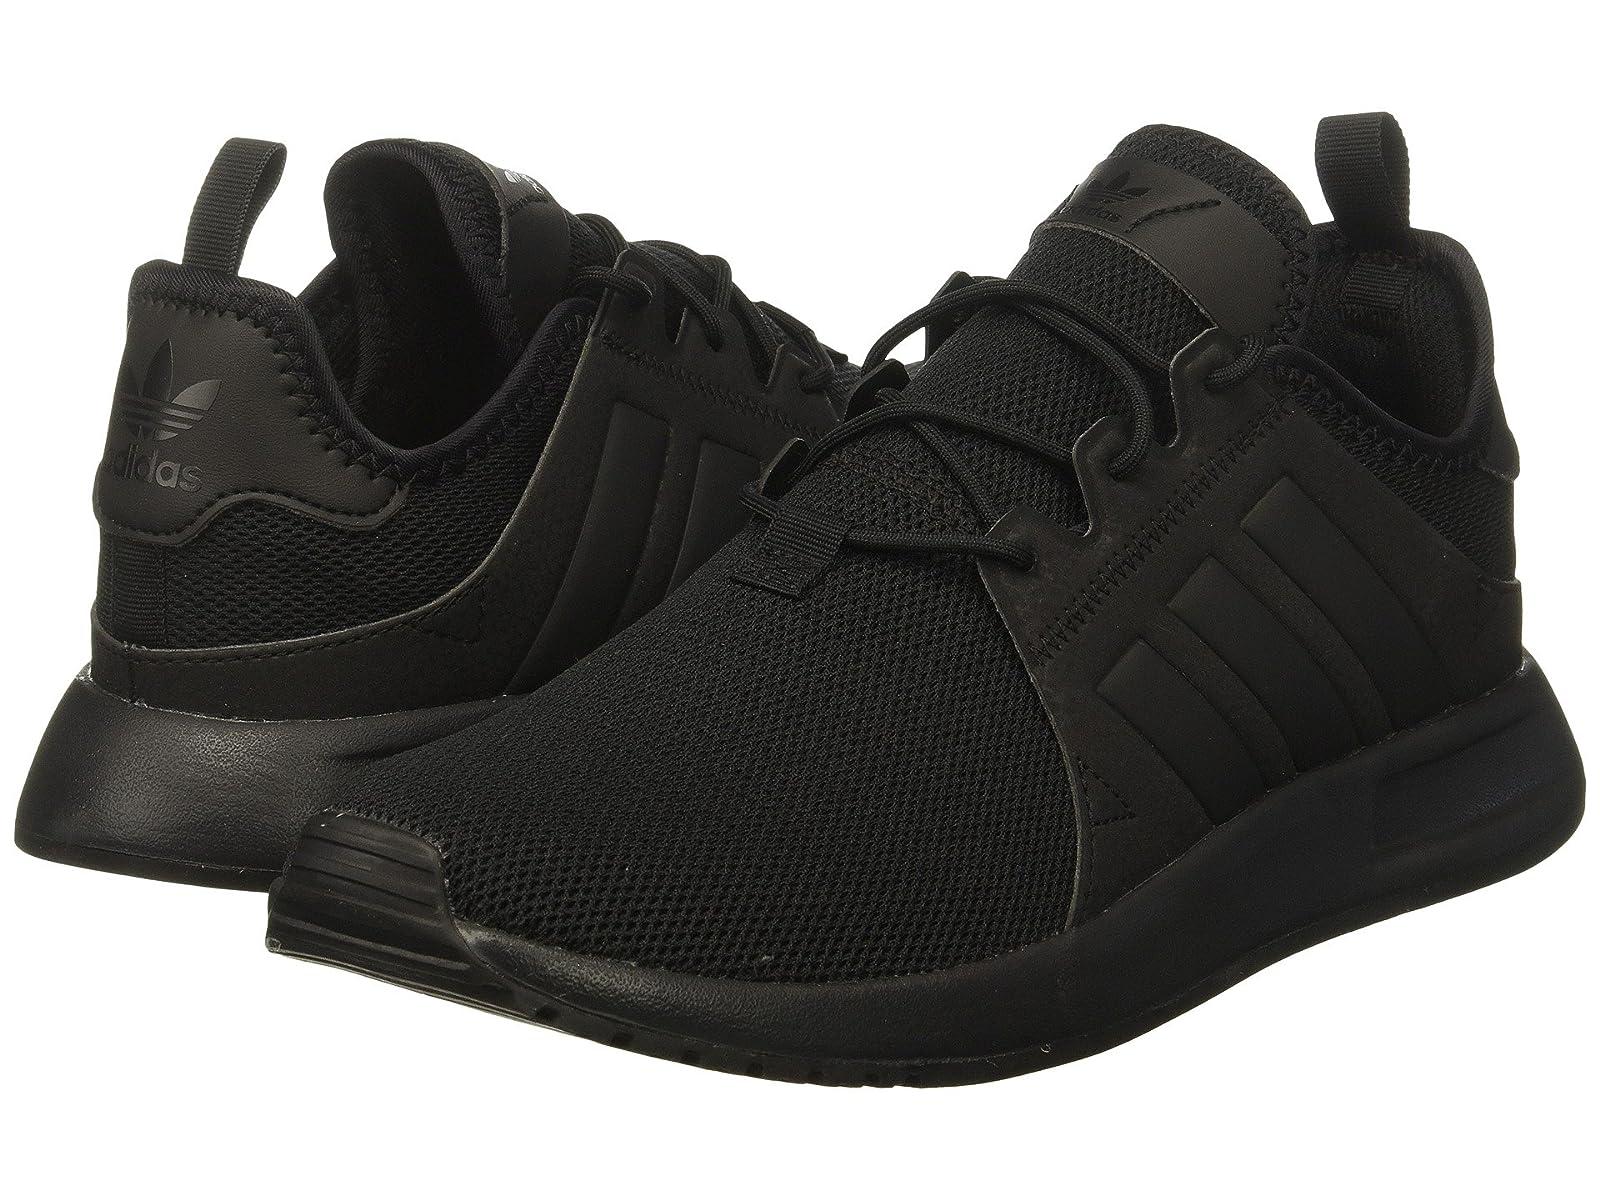 adidas Originals Kids X_PLR (Big Kid)Atmospheric grades have affordable shoes